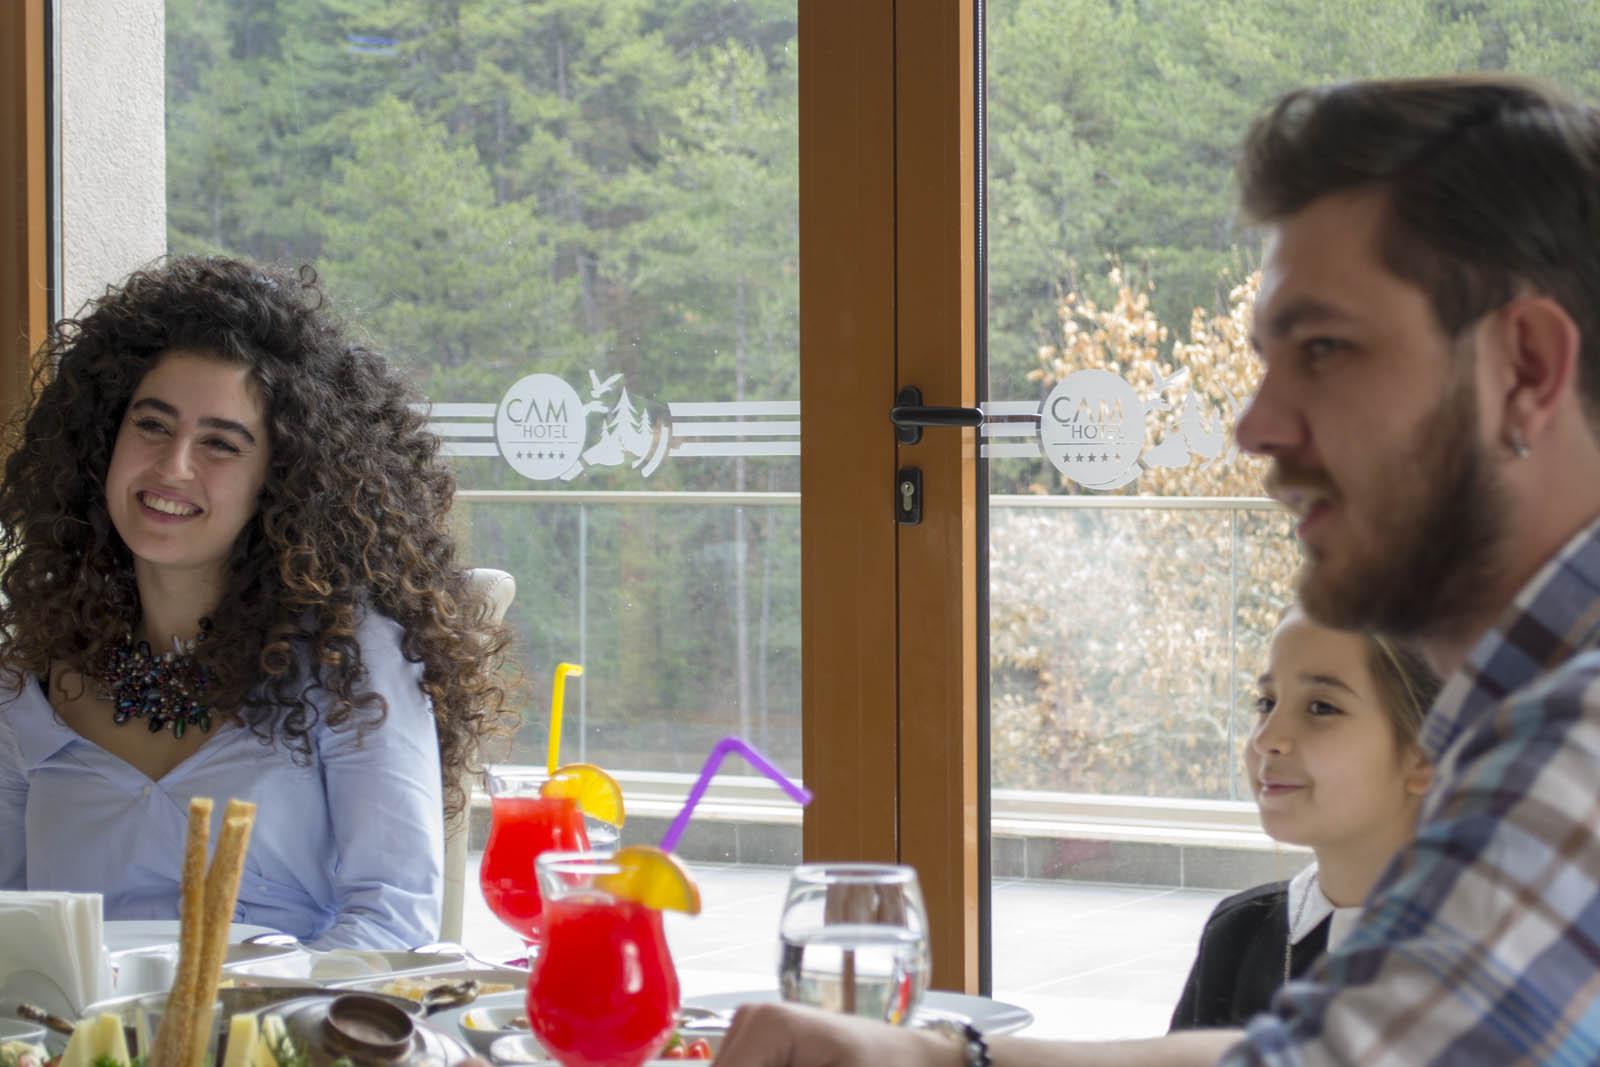 Çam Hotel - Kardelen Restaurant